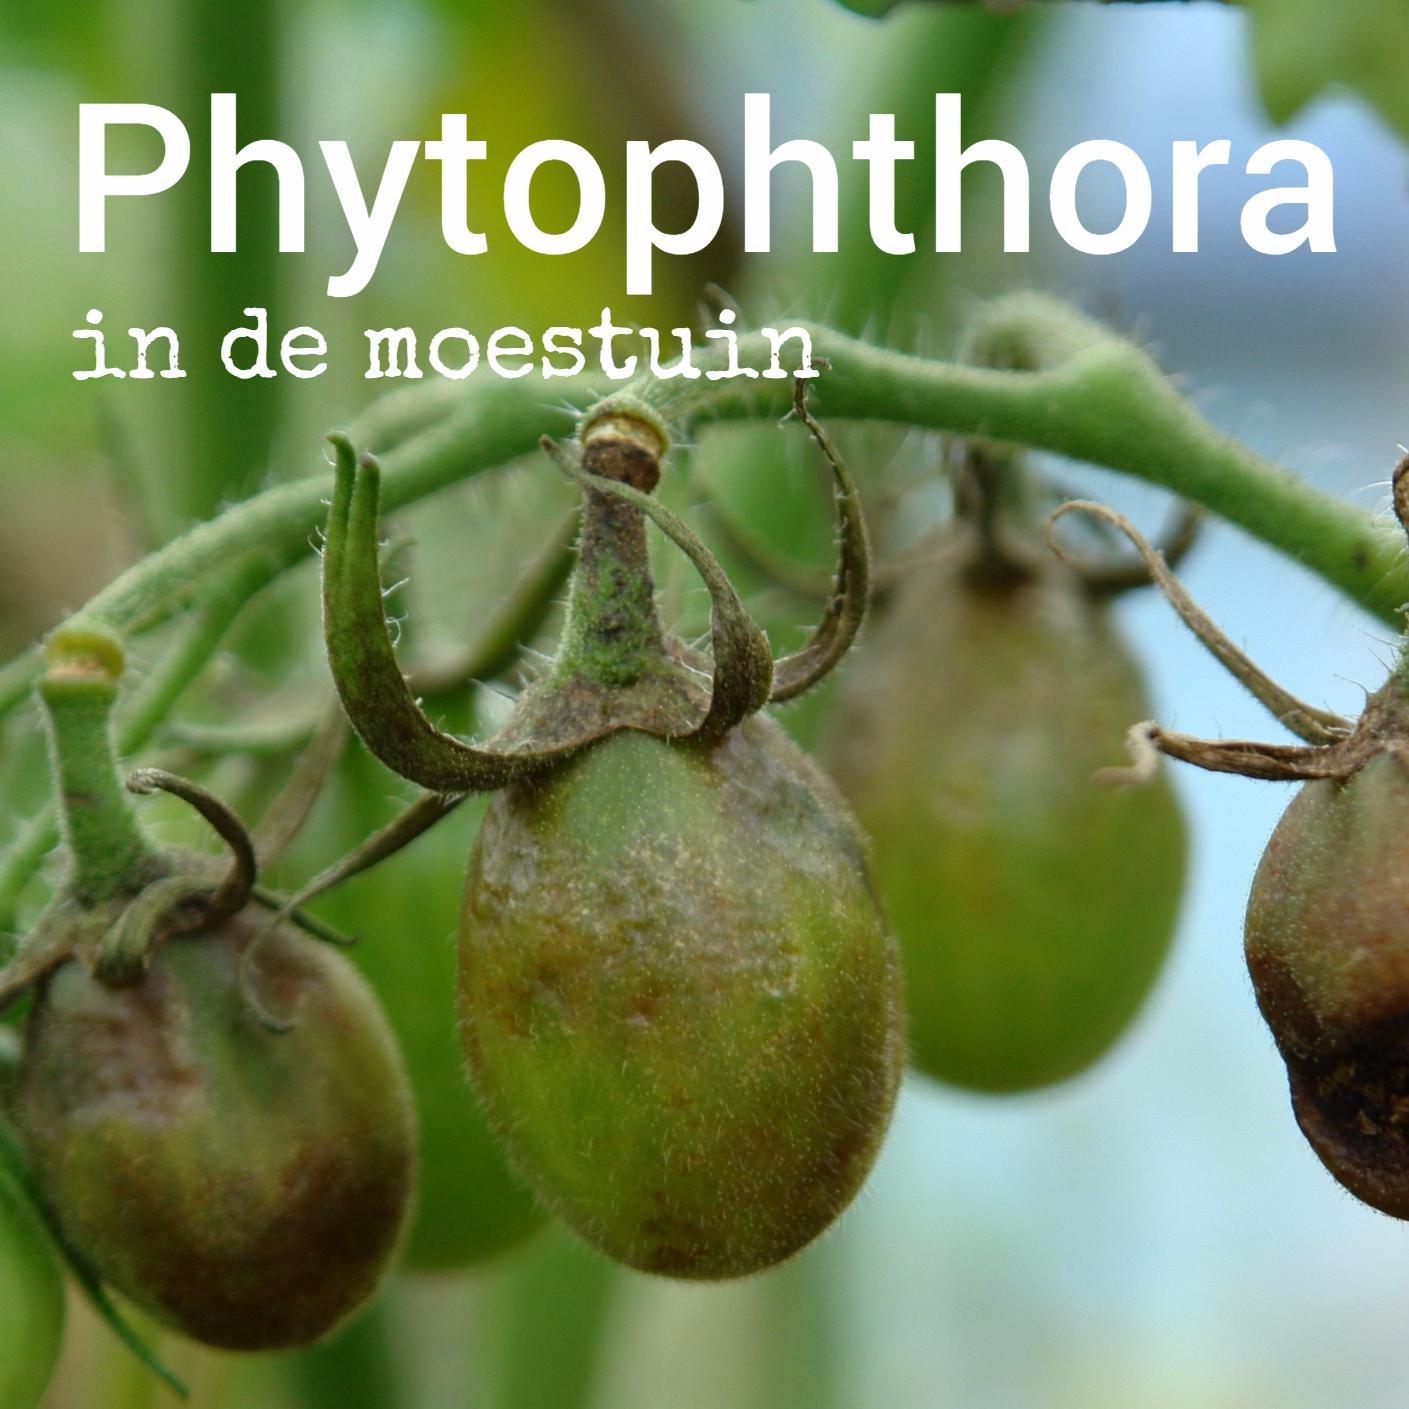 phytophthora infestans moestuin volkstuin aardappels tomaten blight